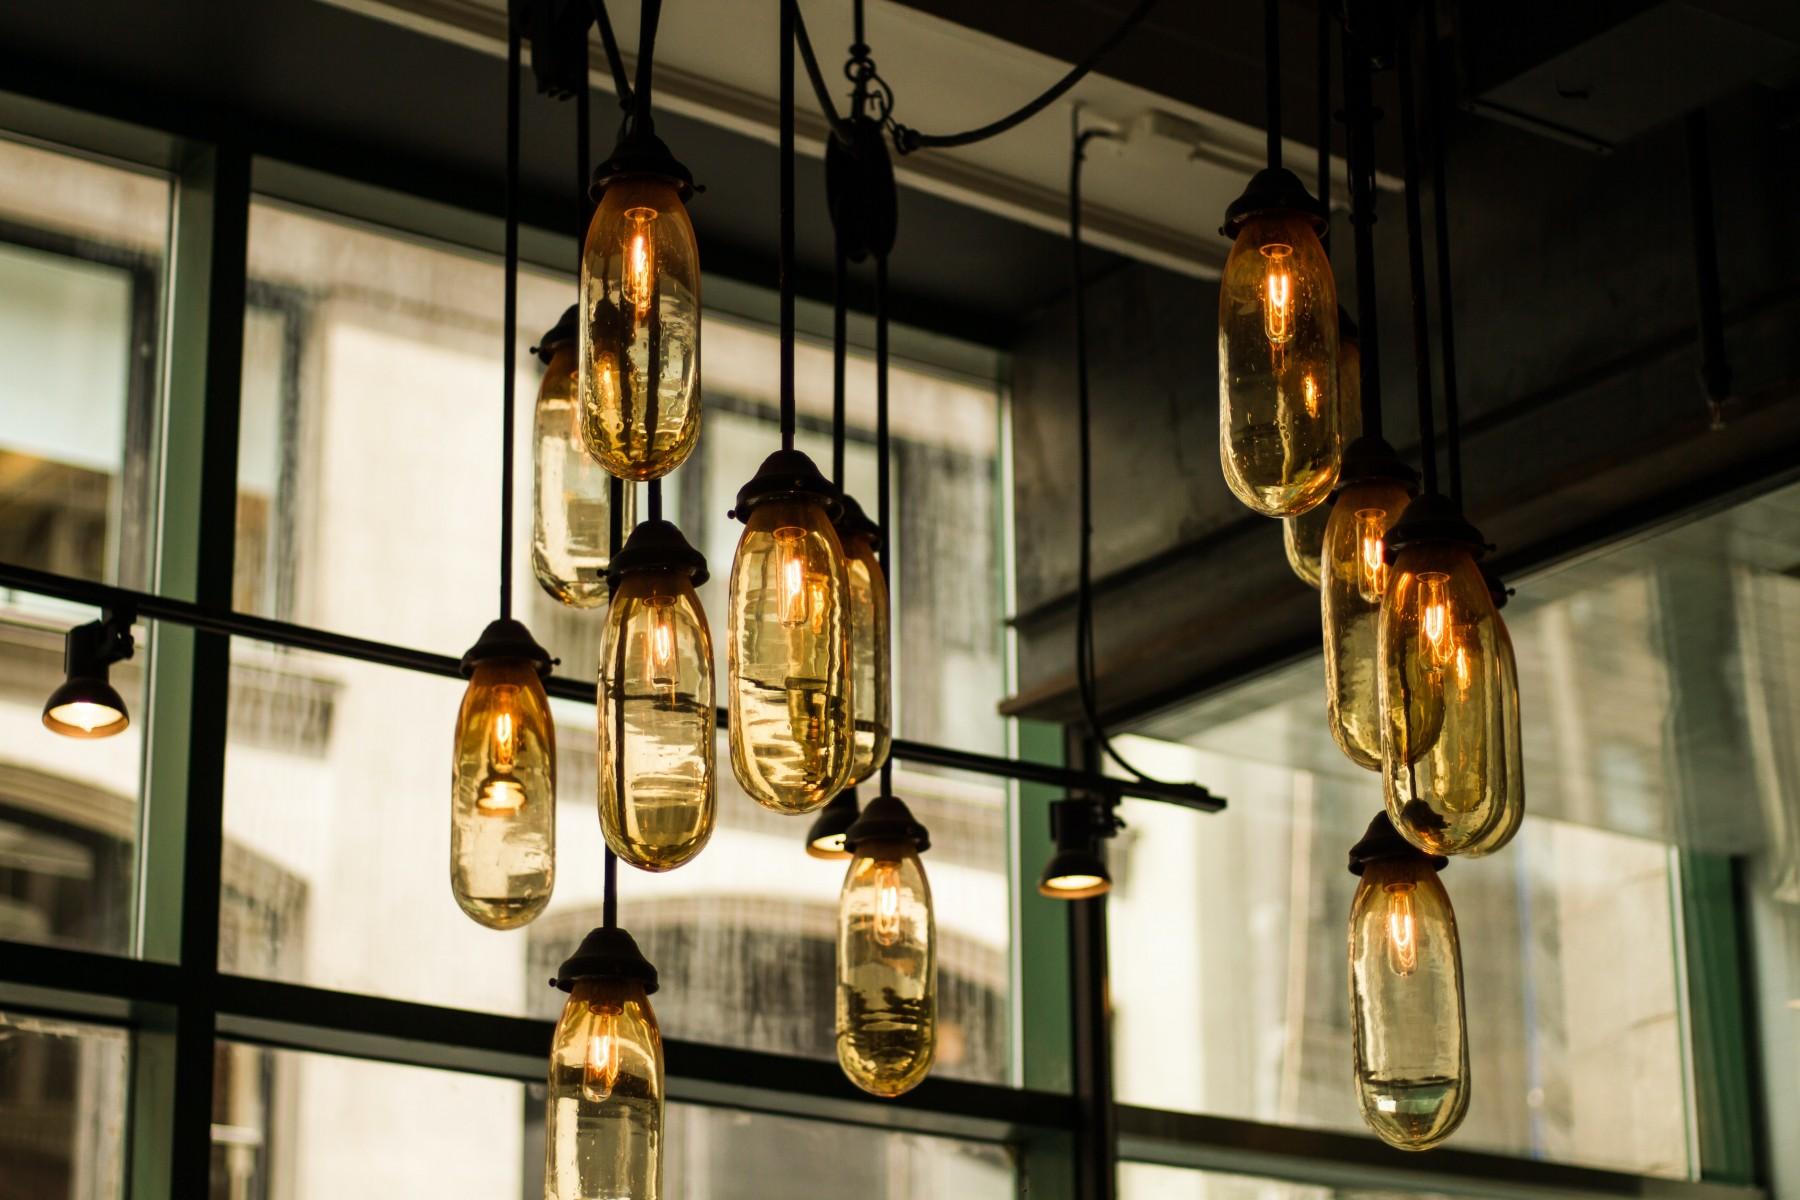 low voltage lighting - Tim Kyle